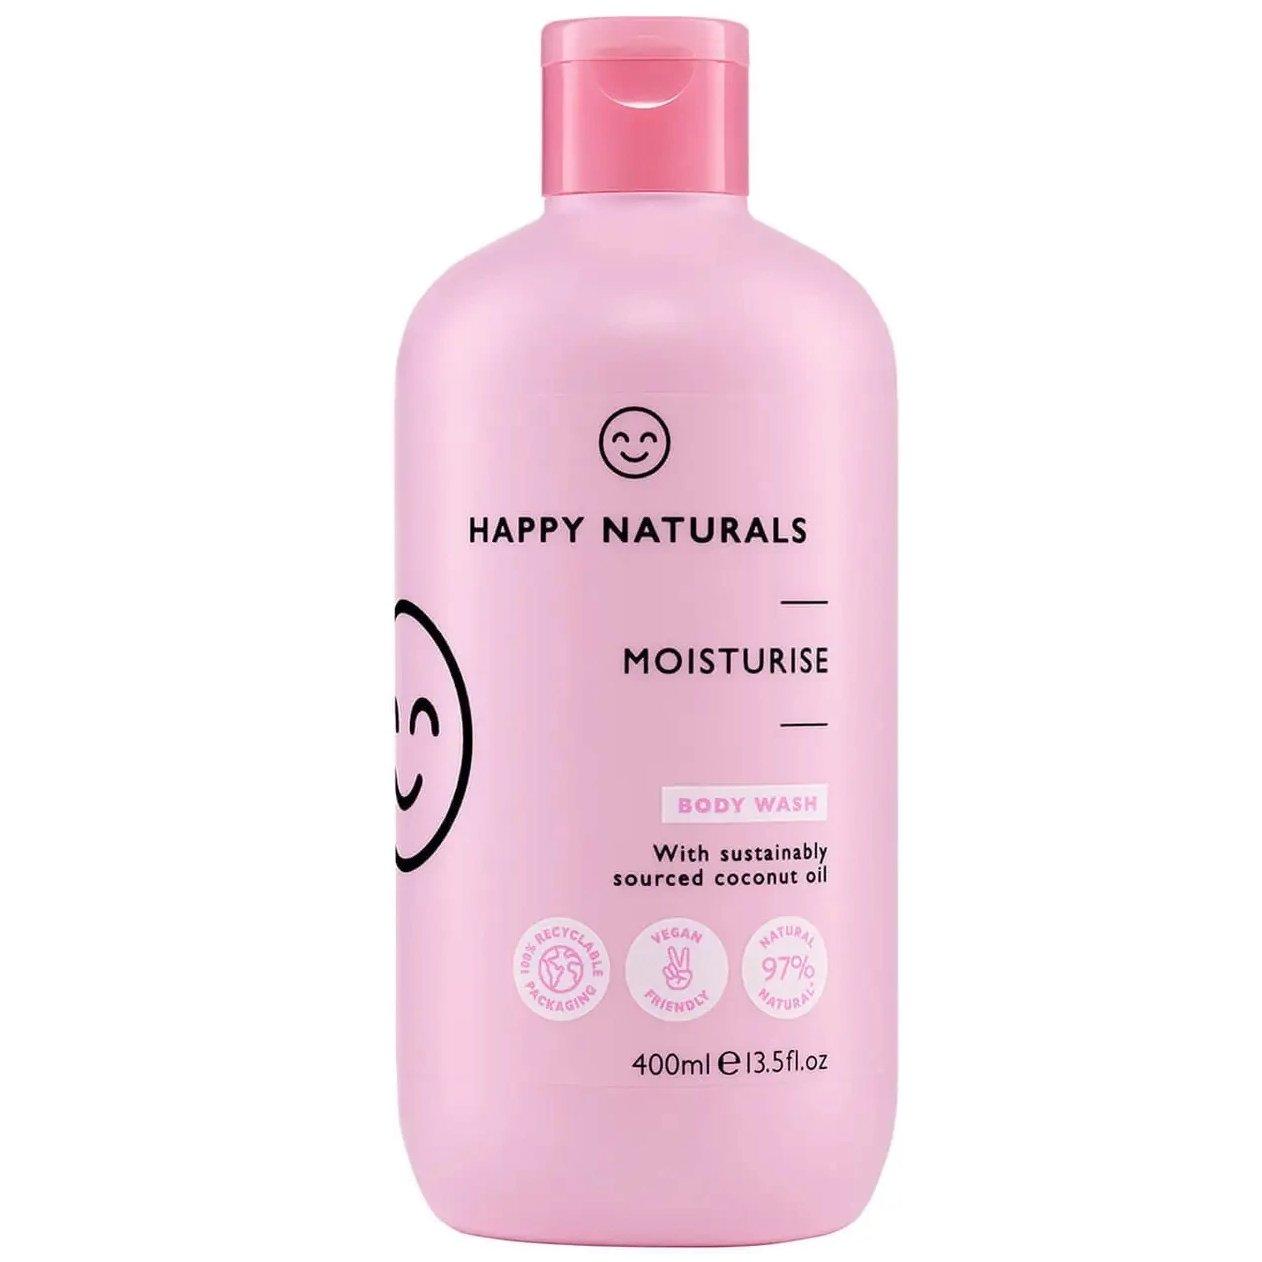 Happy Naturals Moisturise Body Wash Ενυδατικό Κρεμώδες Αφρόλουτρο για Απαλή, Αρωματισμένη Επιδερμίδα 400ml